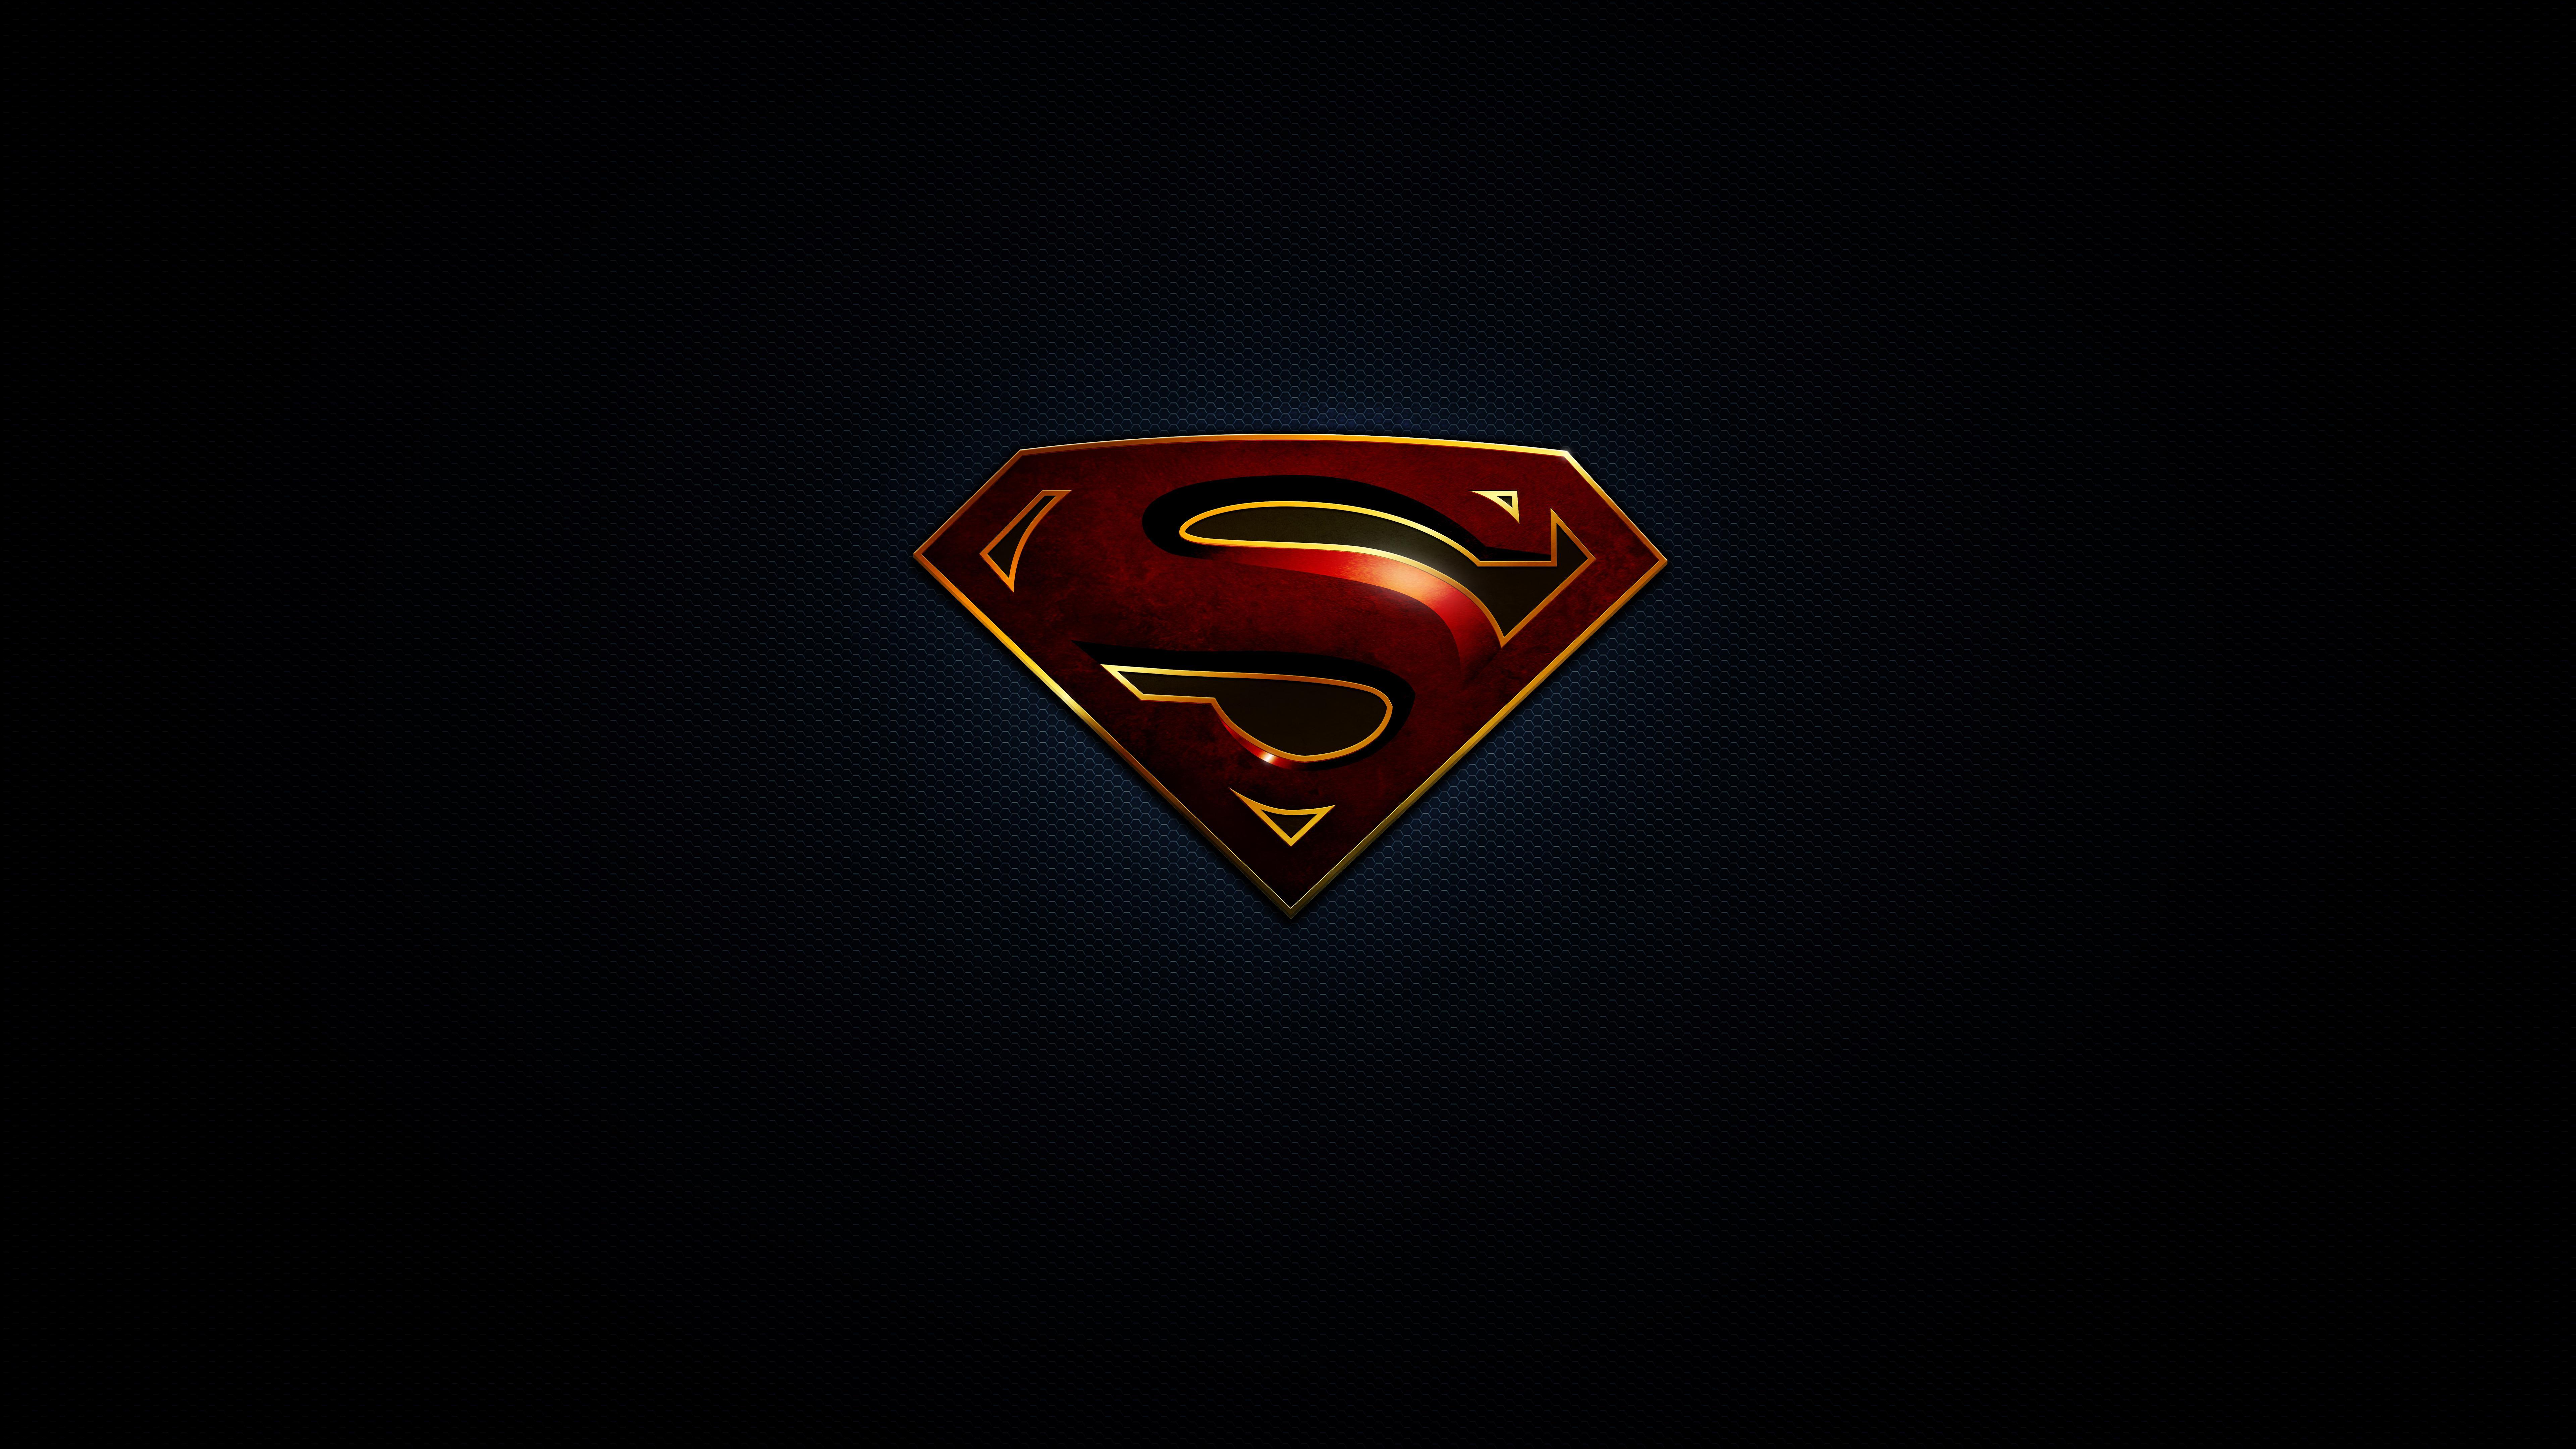 Superman 4K Wallpapers - Wallpaper Cave